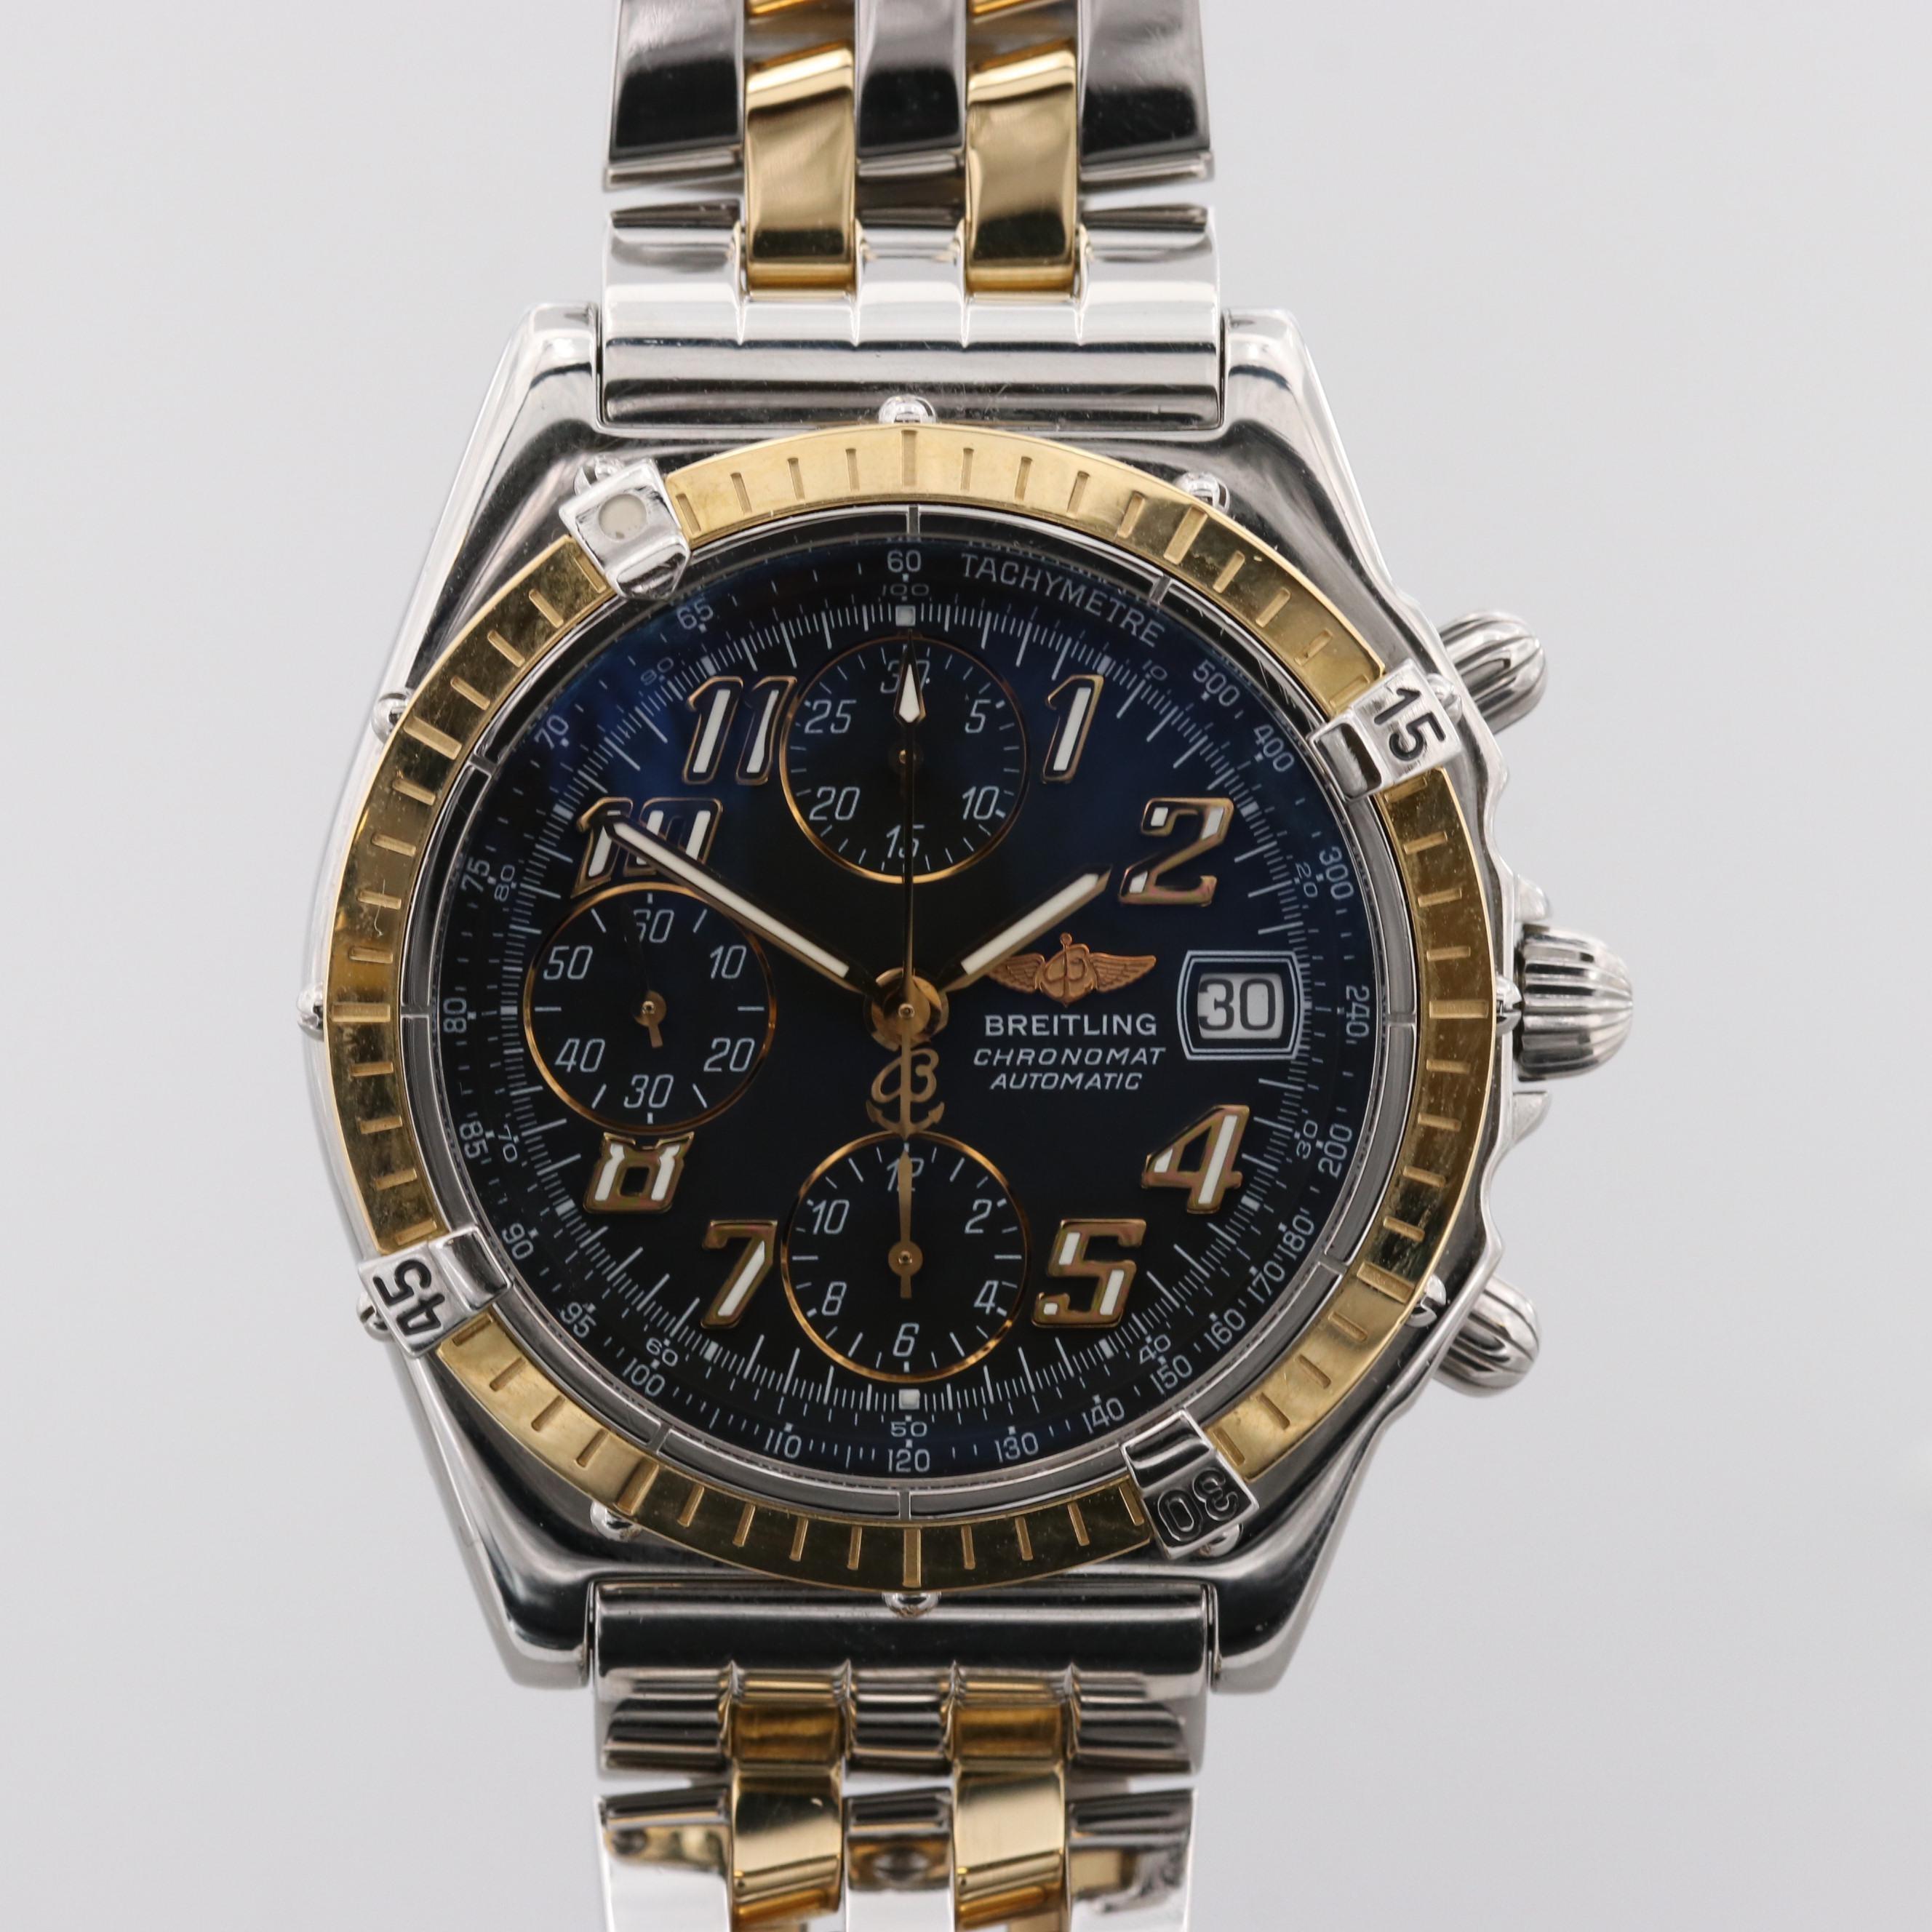 Breitling Chronomat Vitesse 18K Yellow Gold Automatic Wristwatch